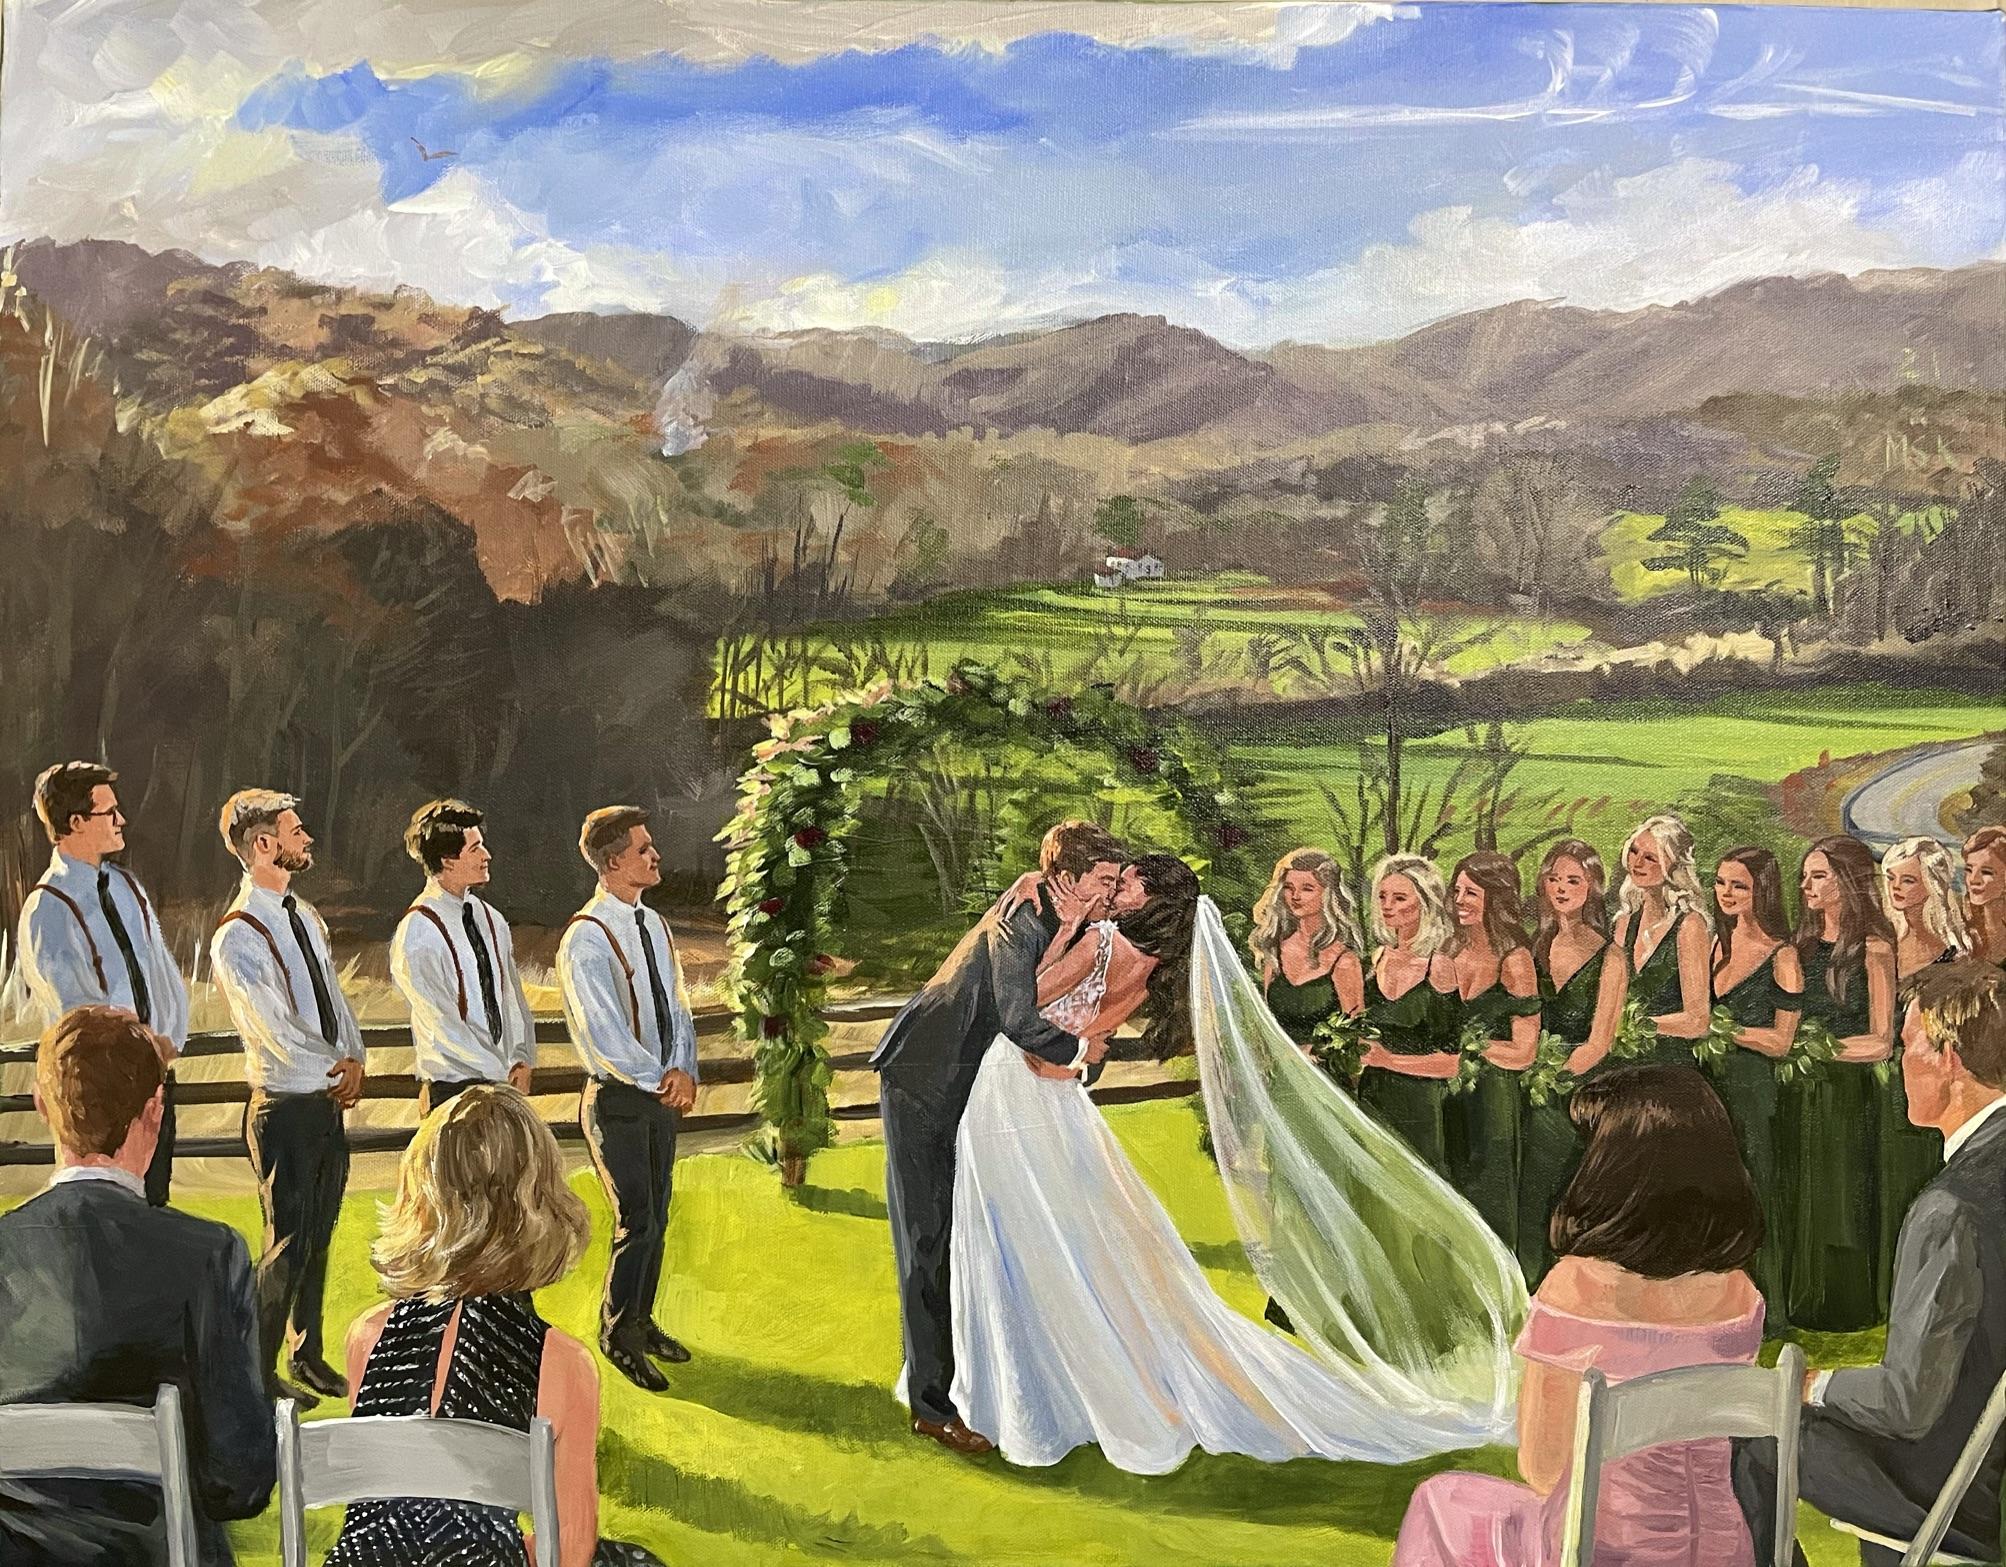 A painting by Maggie Smith Kühn (Source: Maggie Smith Kühn)